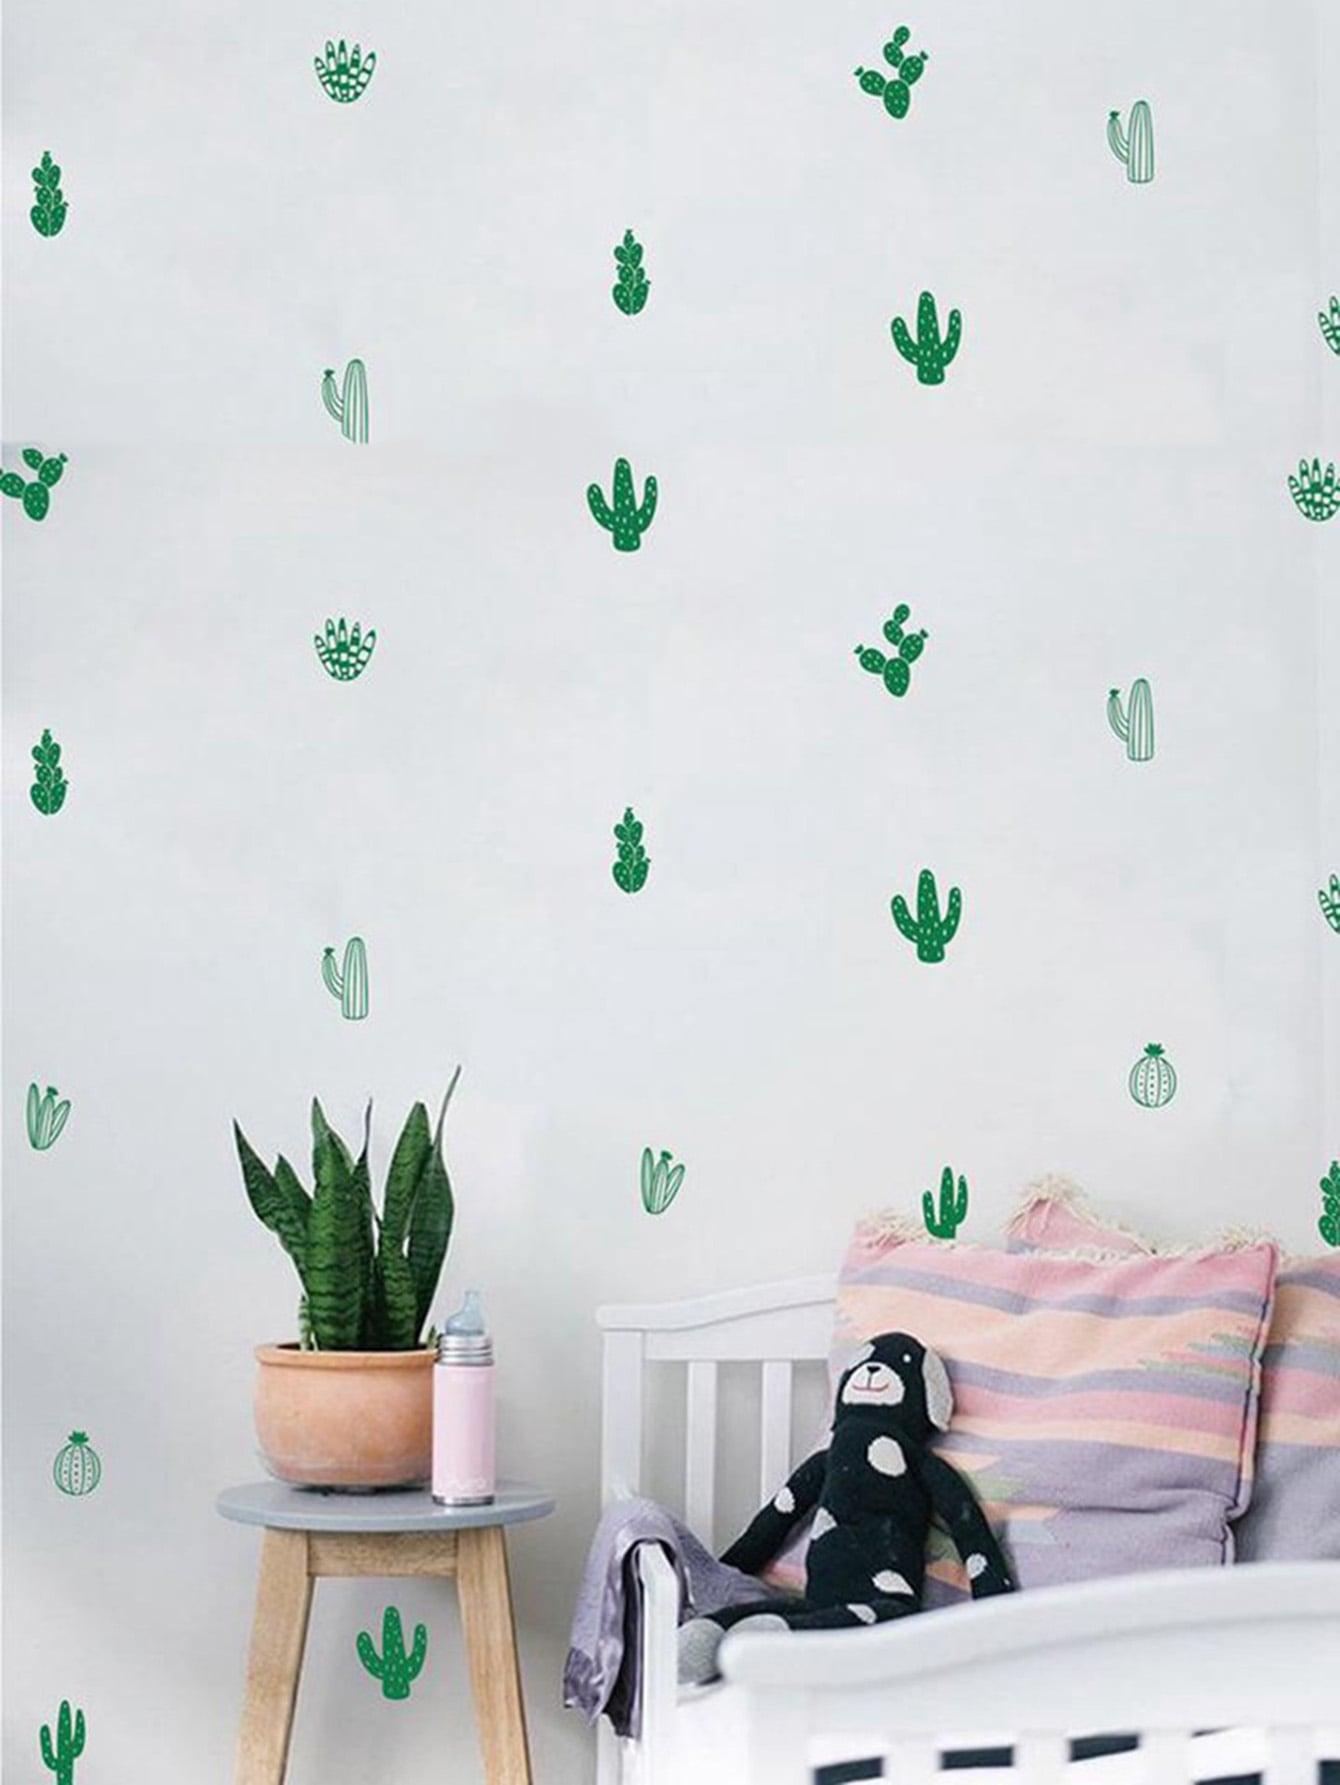 Cactus Decor Wall Sticker